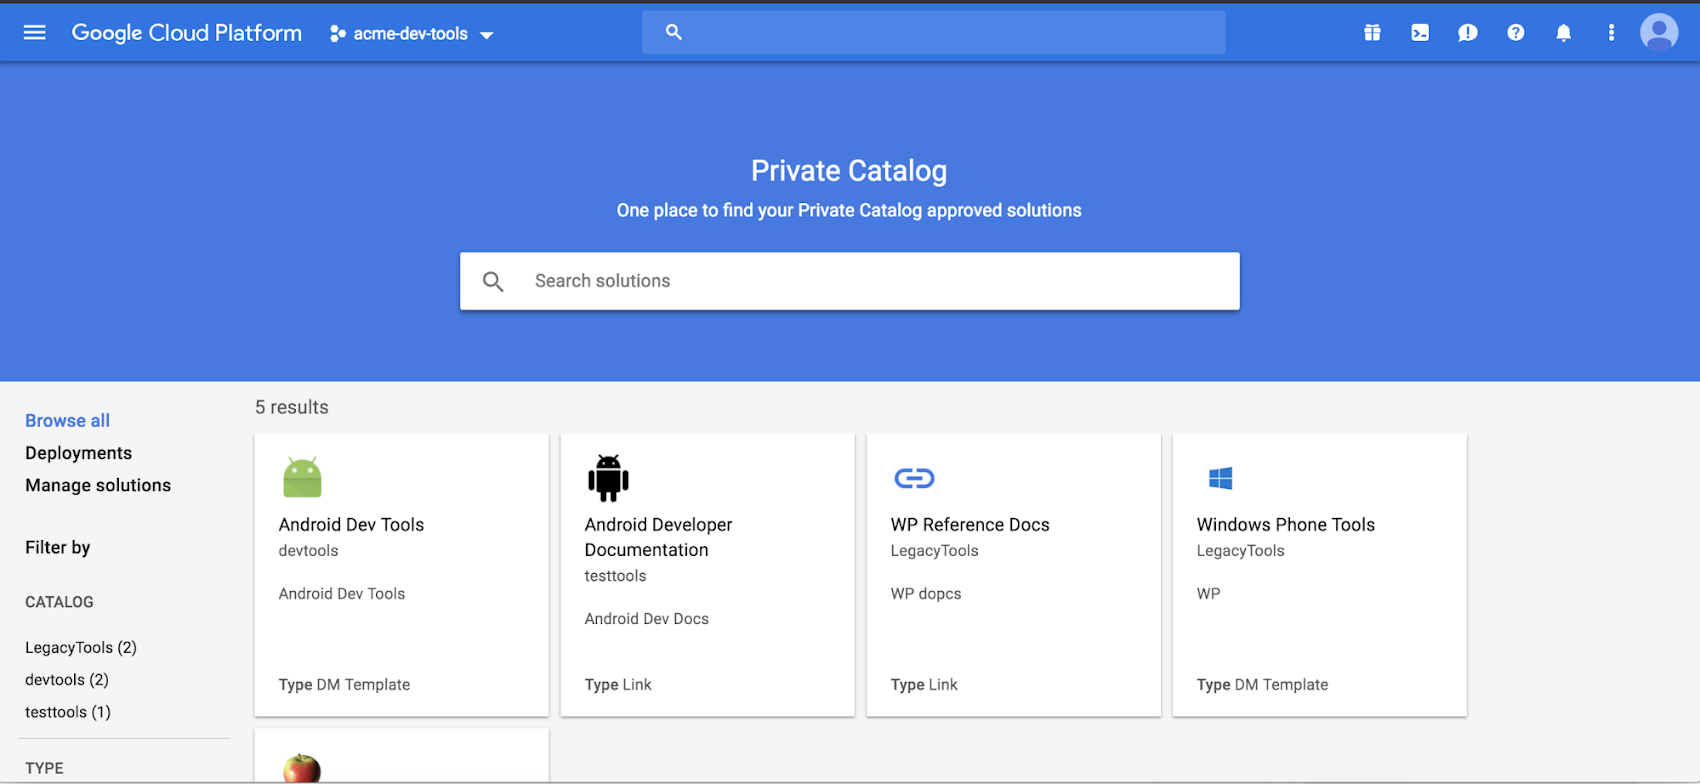 Google Cloud Platform Private Catalog